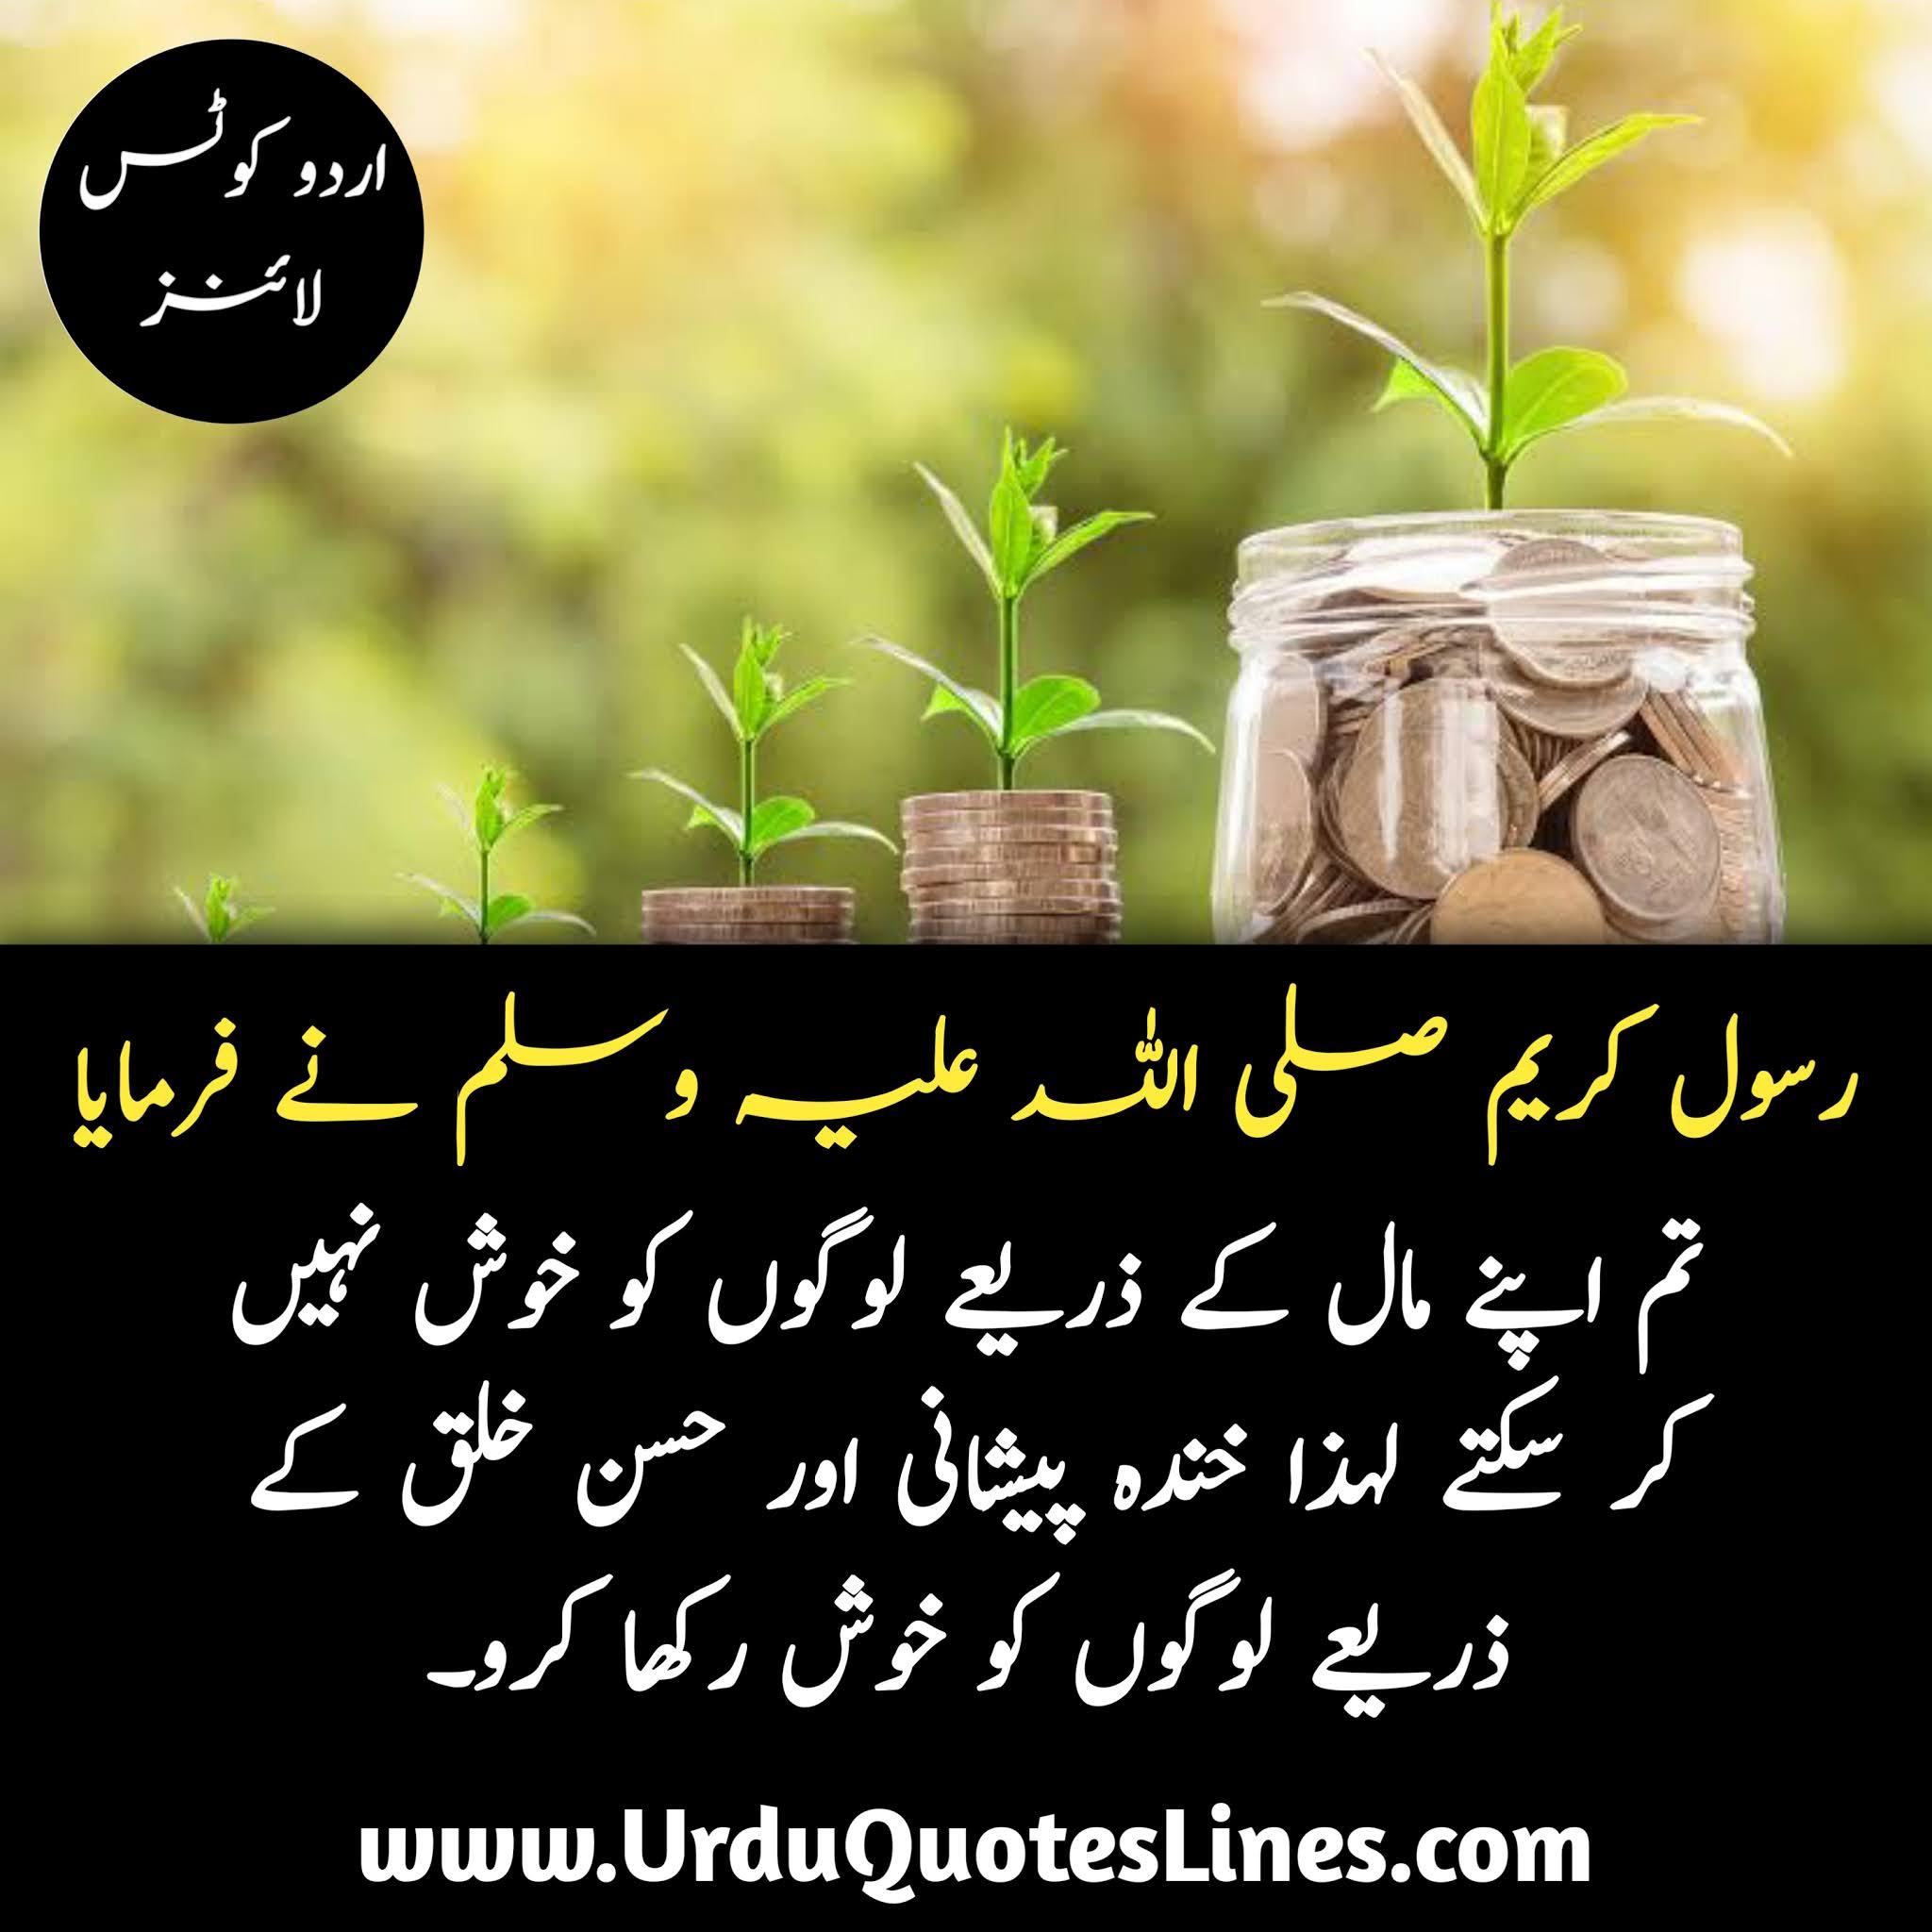 Prophet Muhammad Pbuh Urdu Quotes Lines On Money